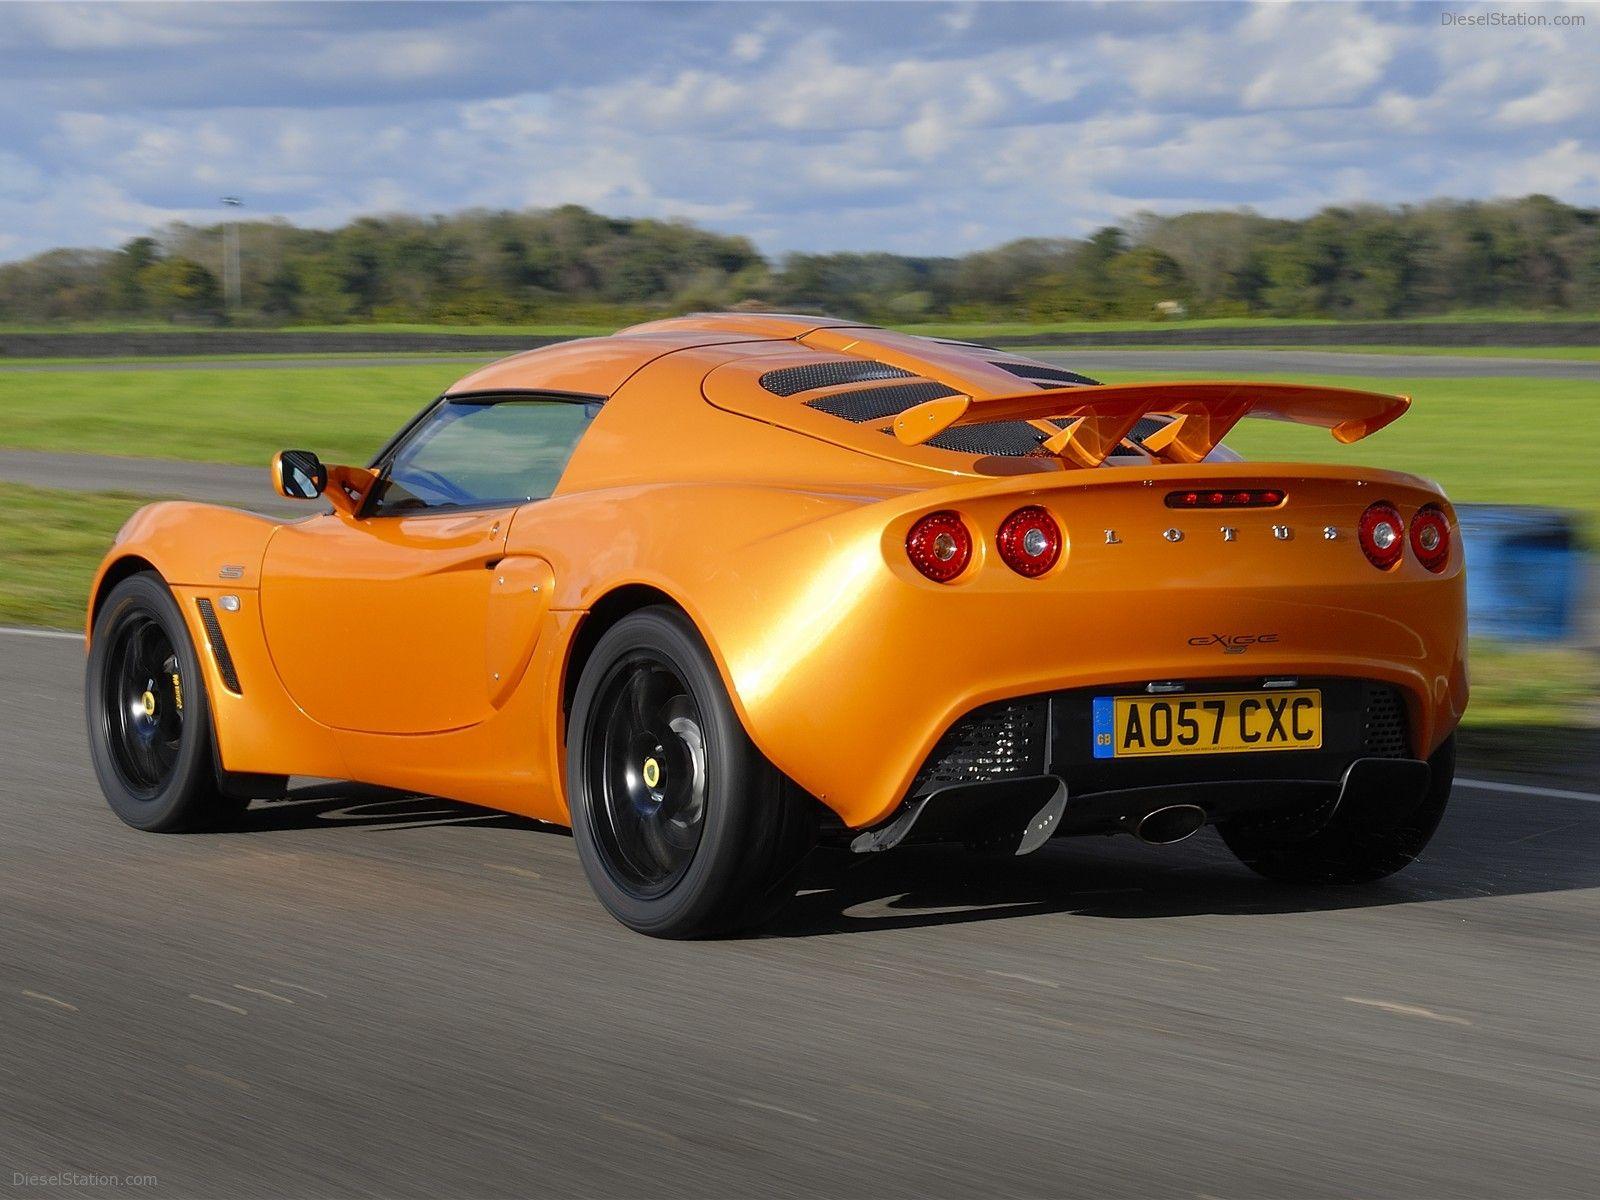 Lotus Exige S Lotus Exige Lotus Concept Cars